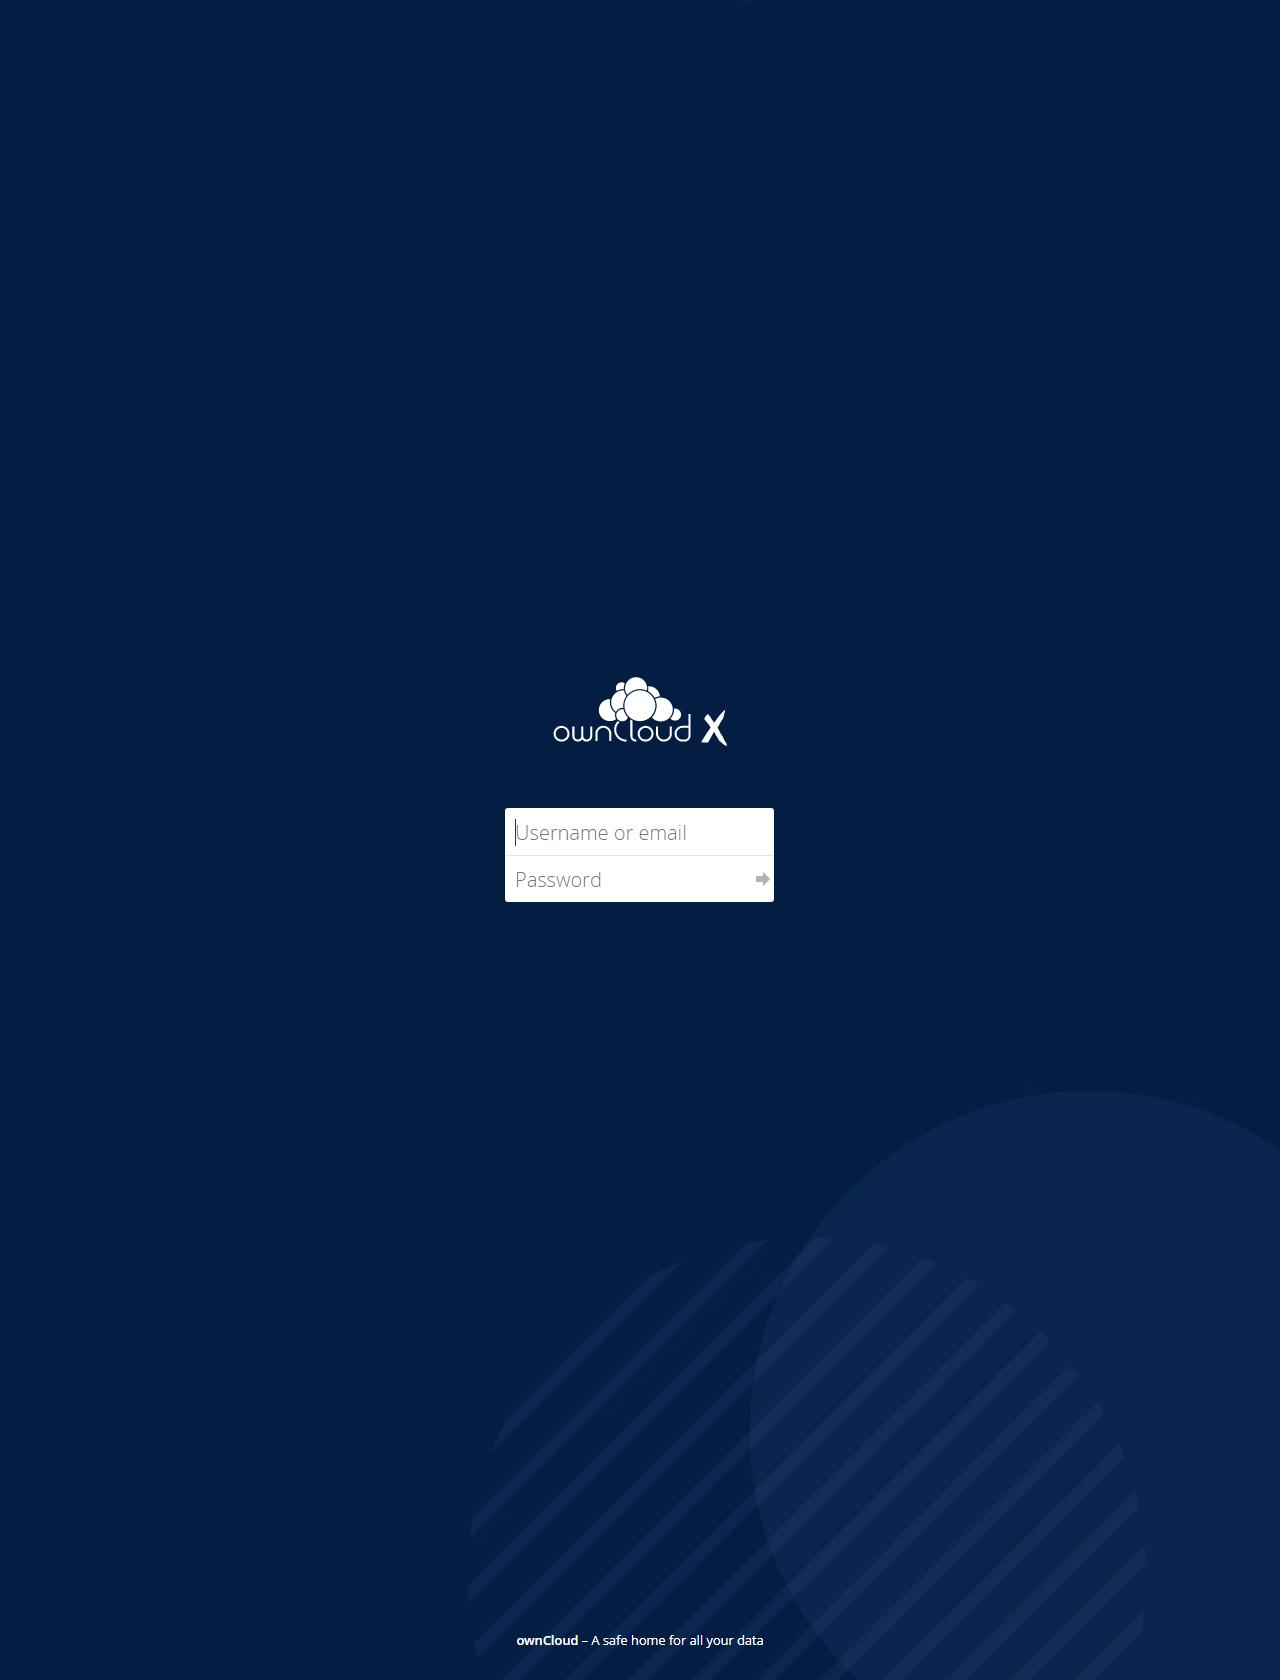 Screenshot Desktop - https://cloud.independencia.cl/index.php/login